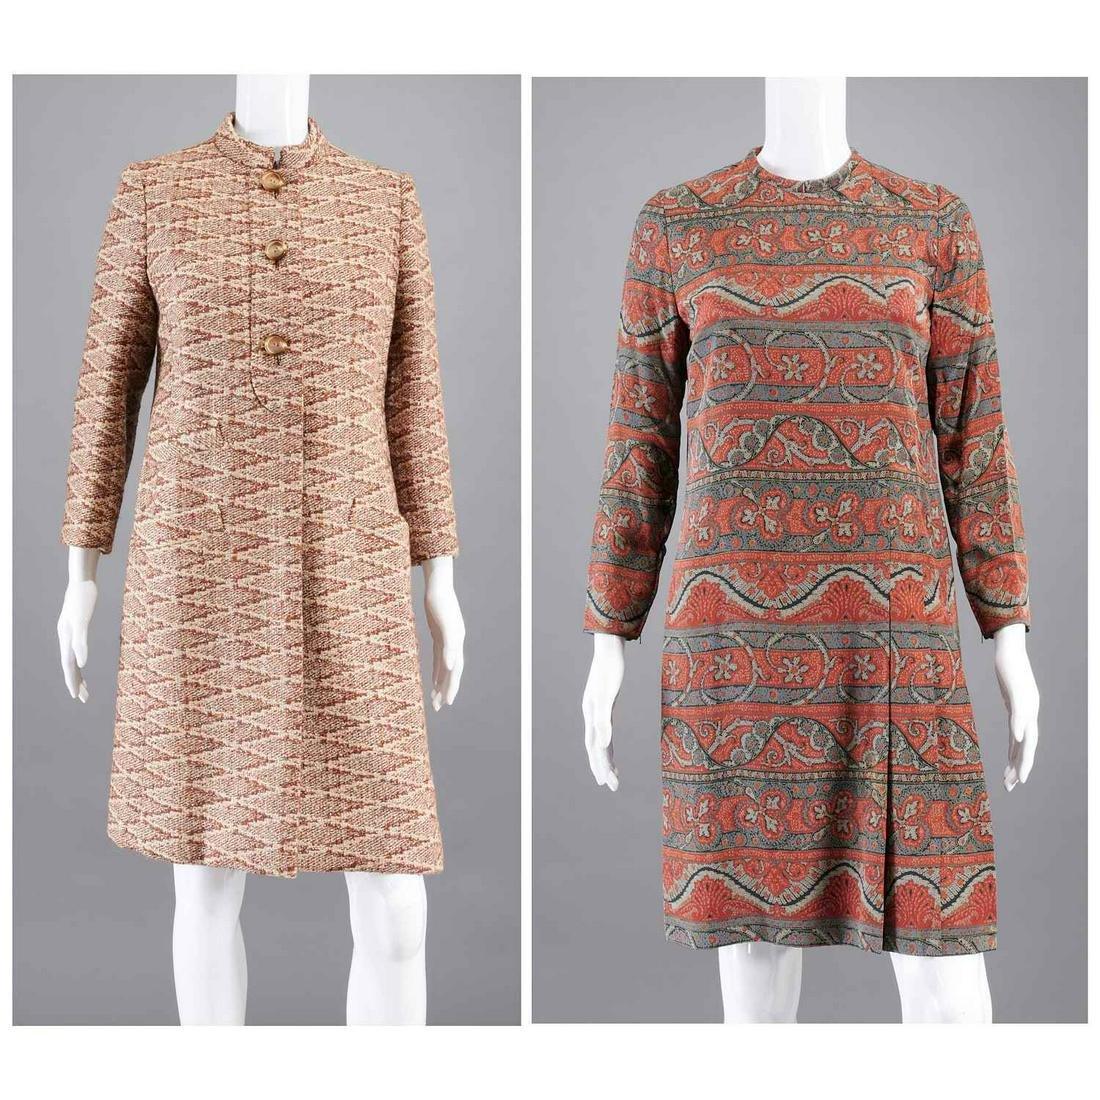 Vintage Bill Blass coat dress ensemble